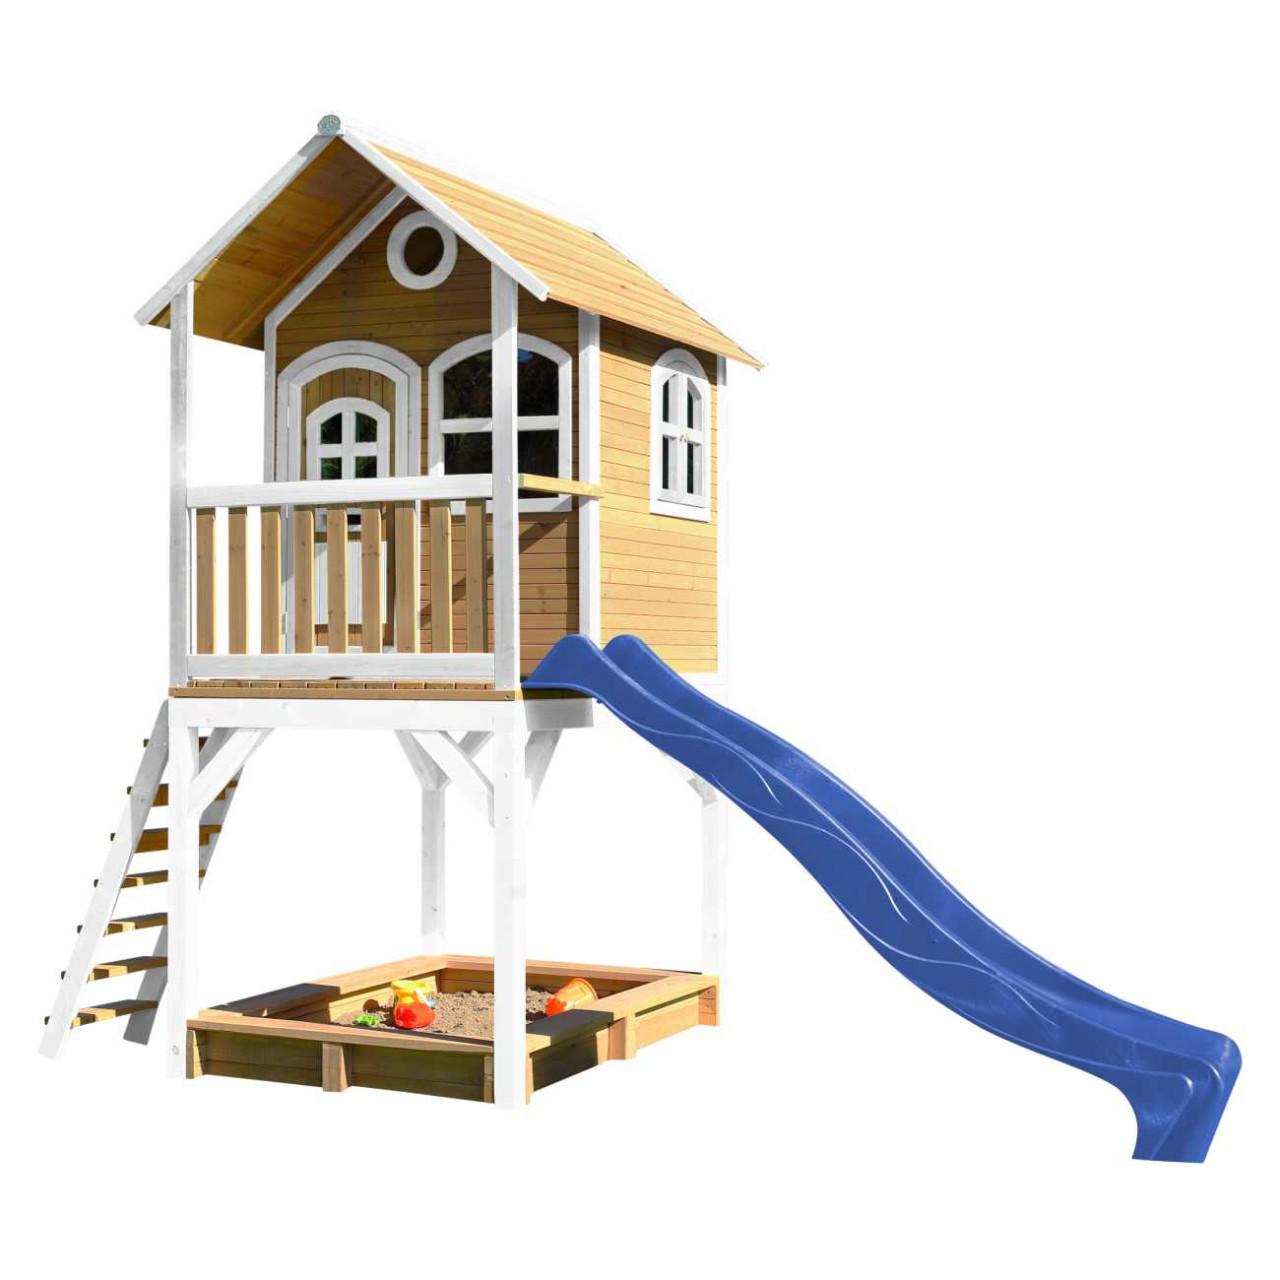 Axi Stelzenhaus Sarah, Kinder Spielhaus